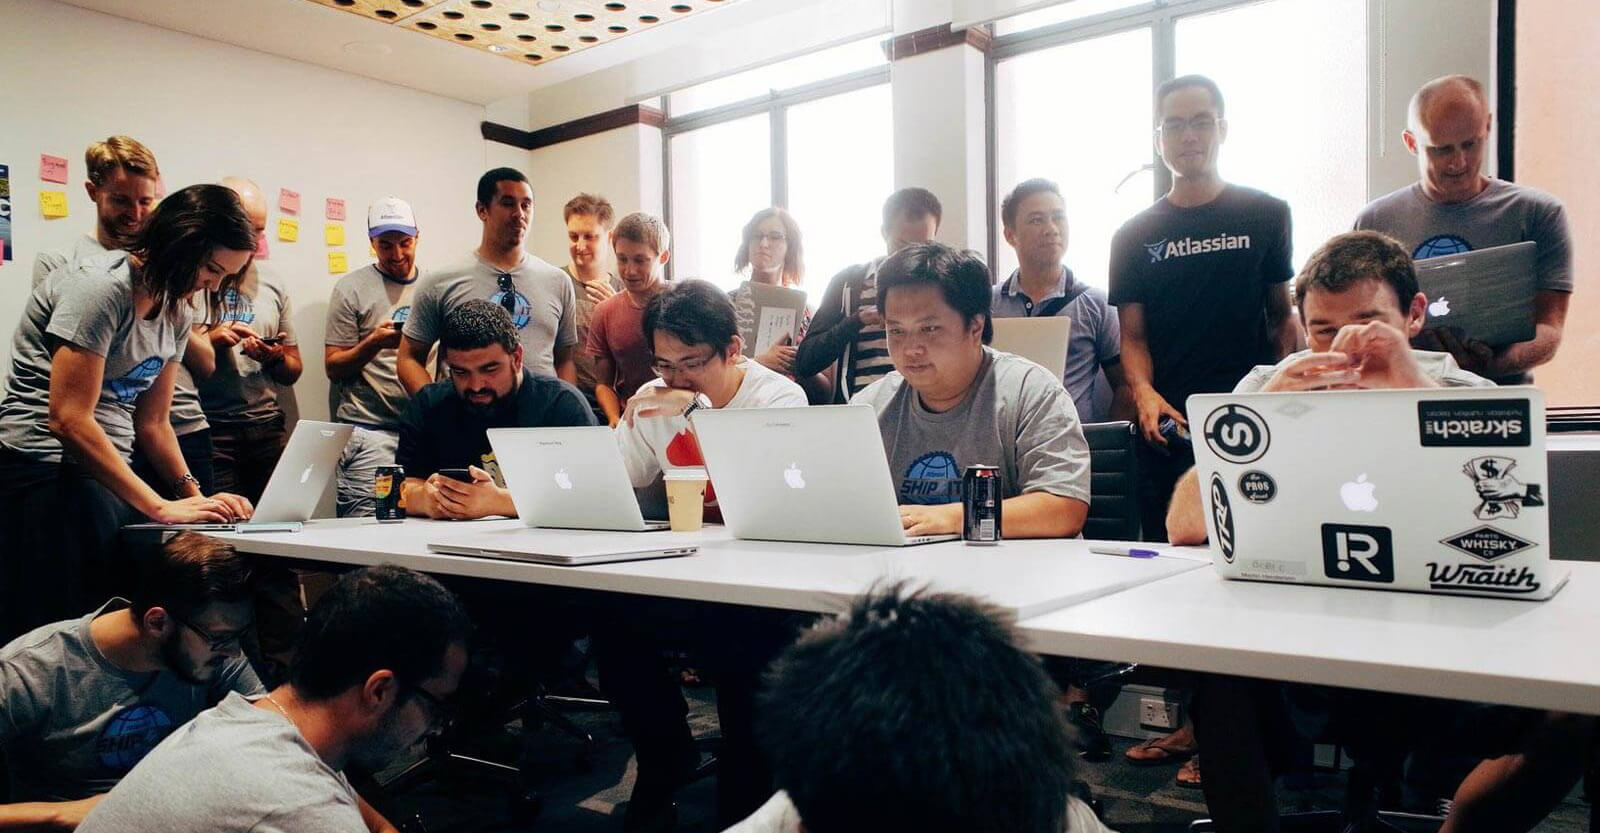 Atlassian-Mitarbeiter nehmen am ShipIt Day teil